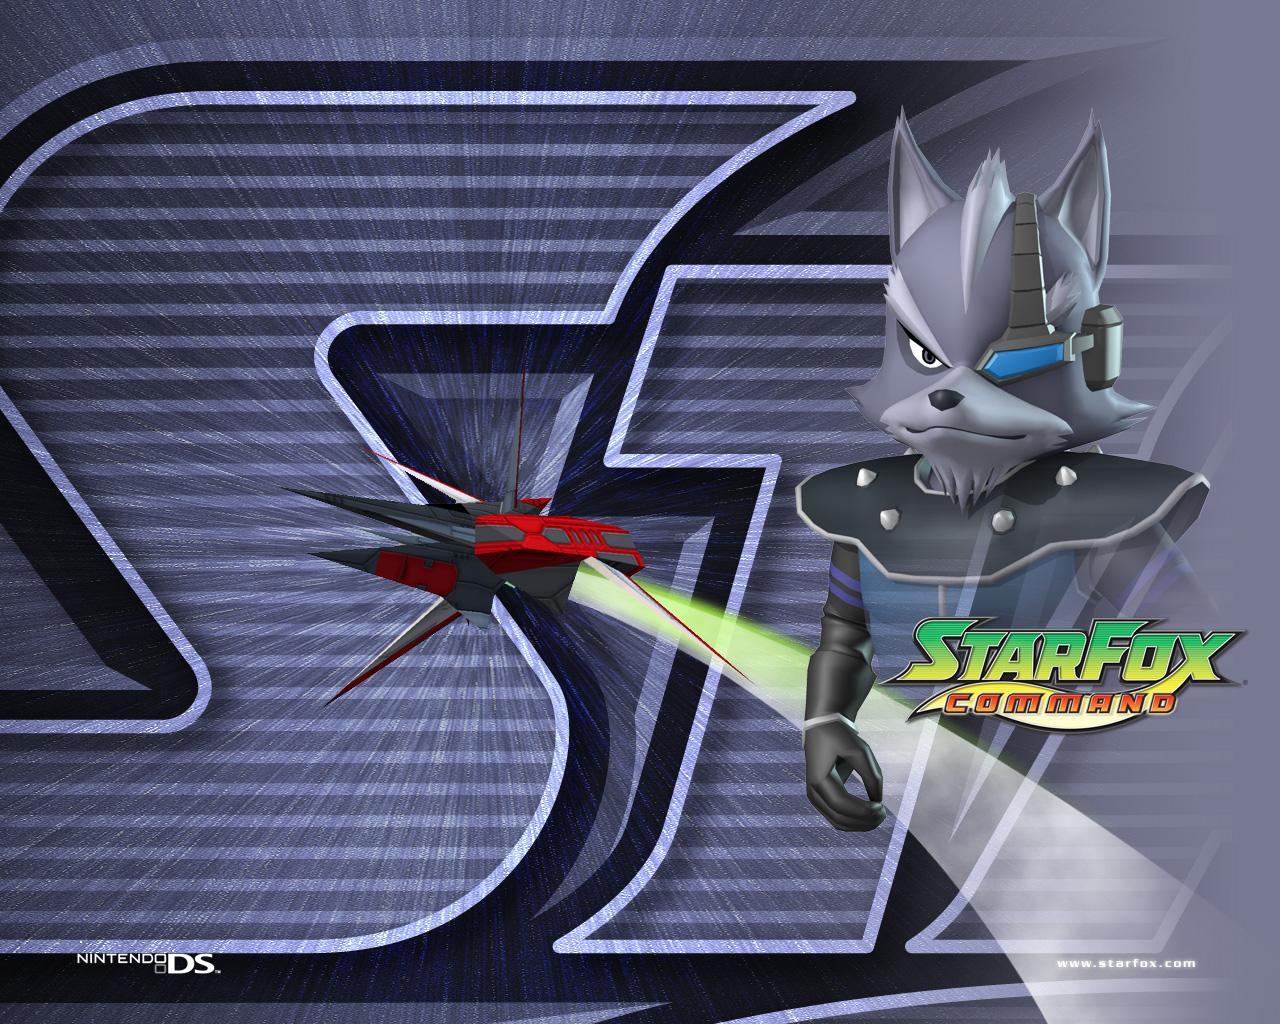 starfox wallpaper6 1280